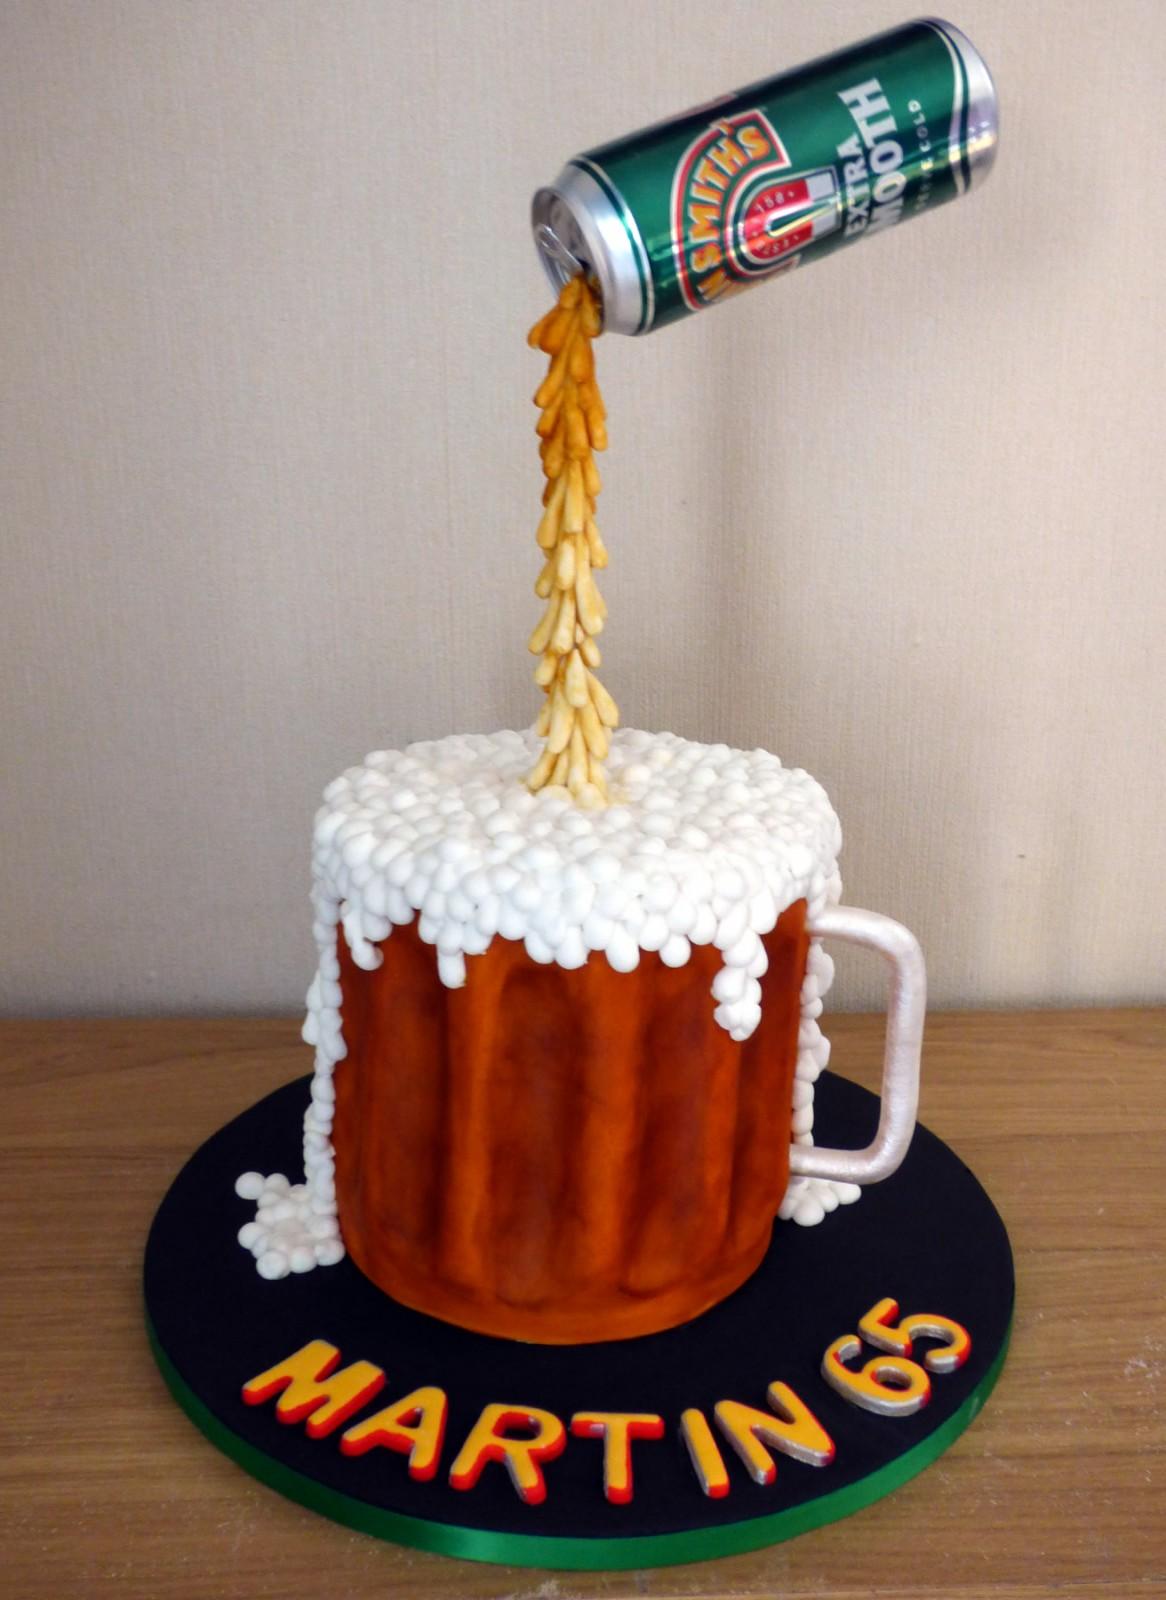 Astounding John Smiths Suspended Beer Can Birthday Cake Susies Cakes Birthday Cards Printable Benkemecafe Filternl